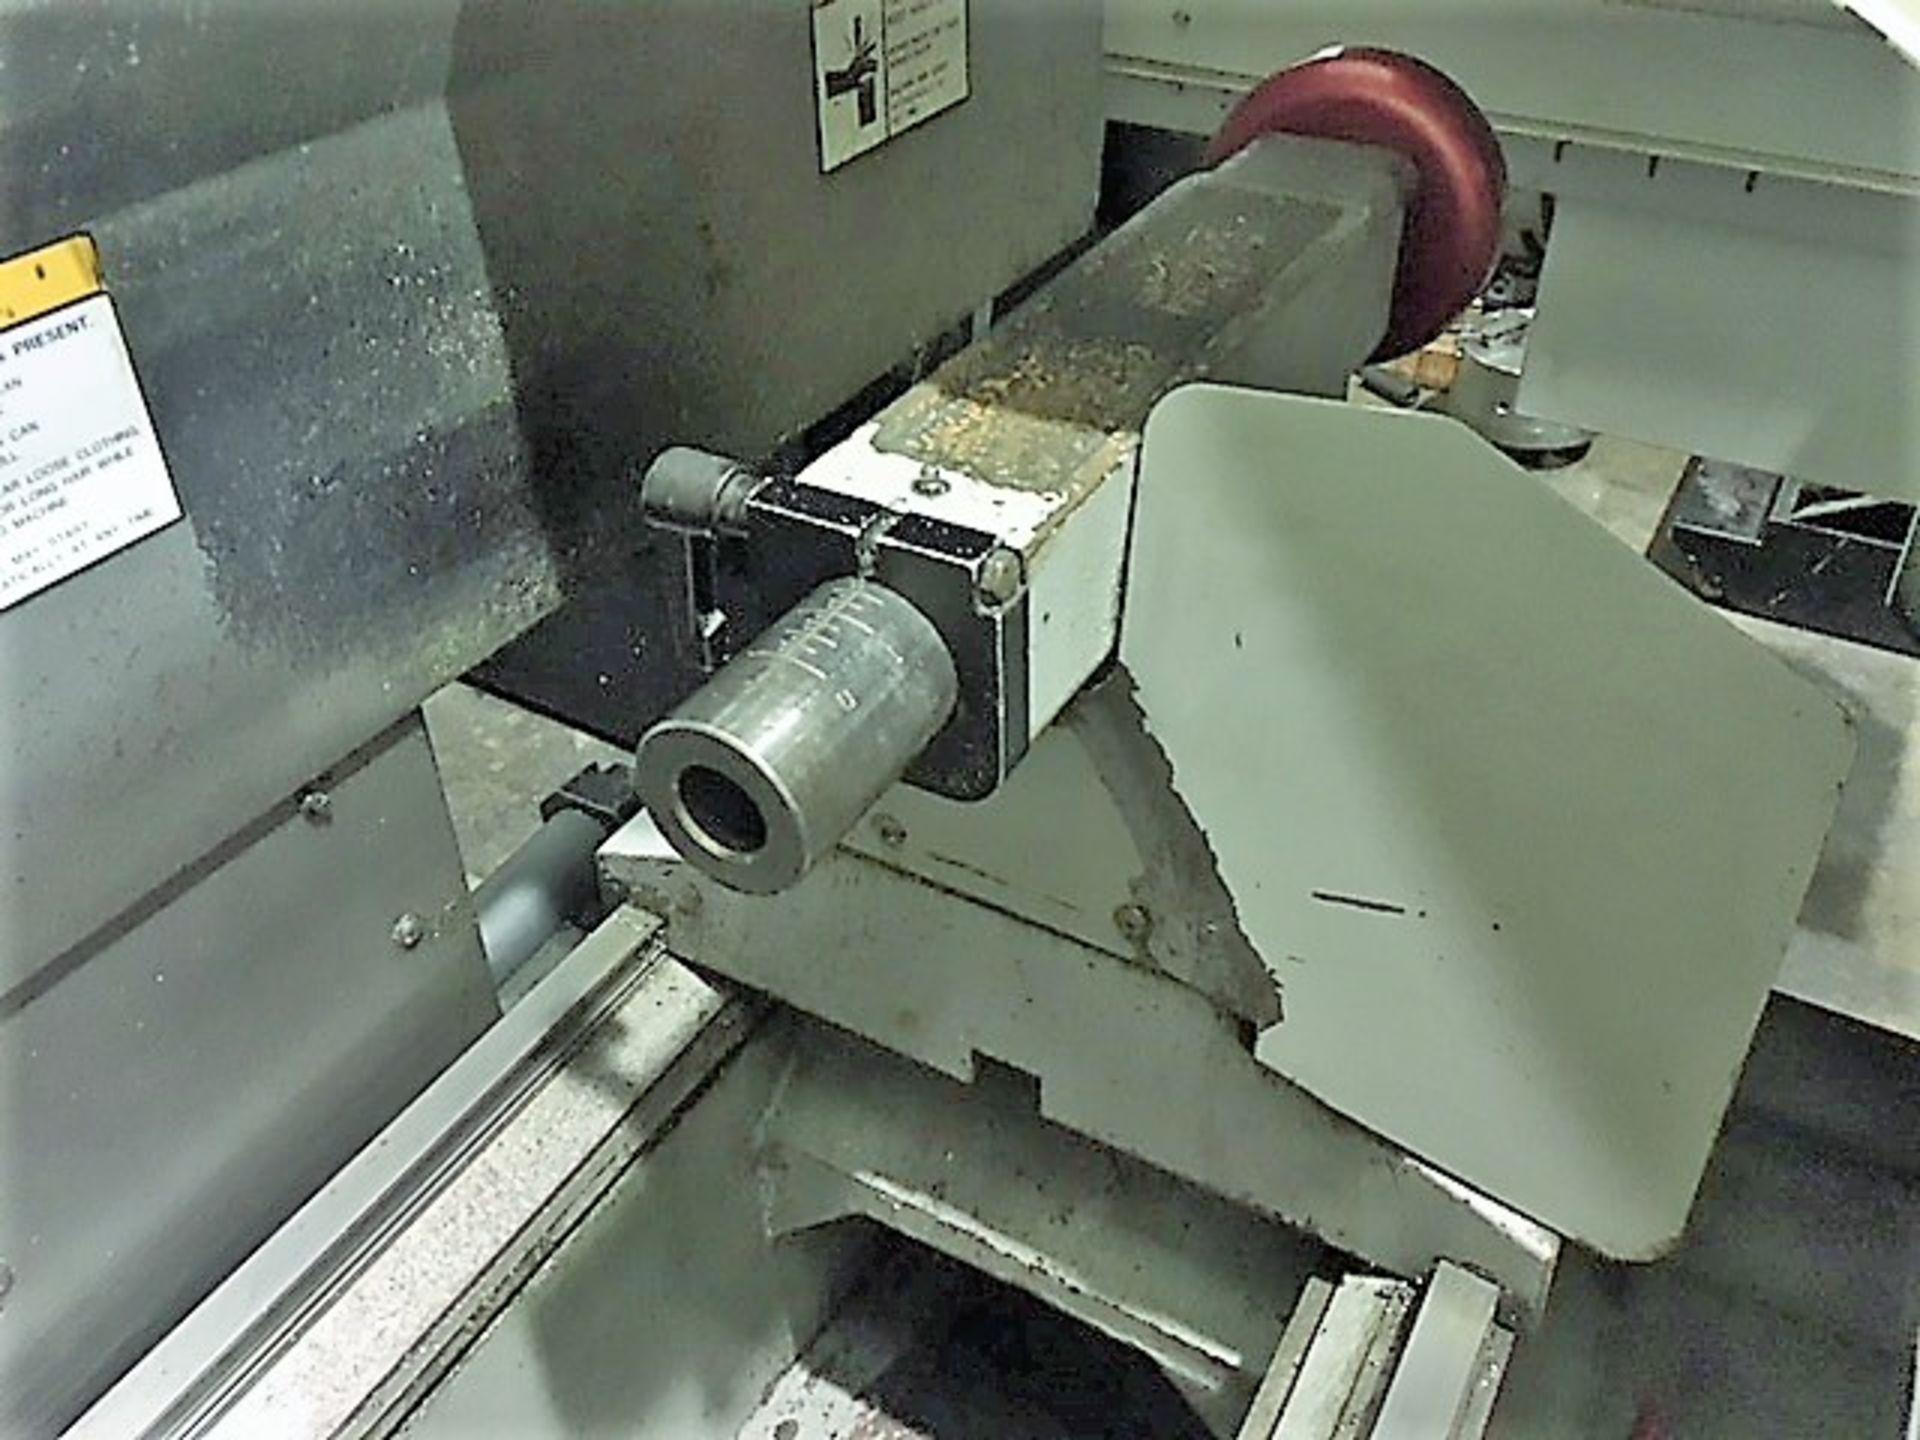 Lot 26 - Haas TL-1 CNC Tool Room Lathe, S/N 69901, New 2005